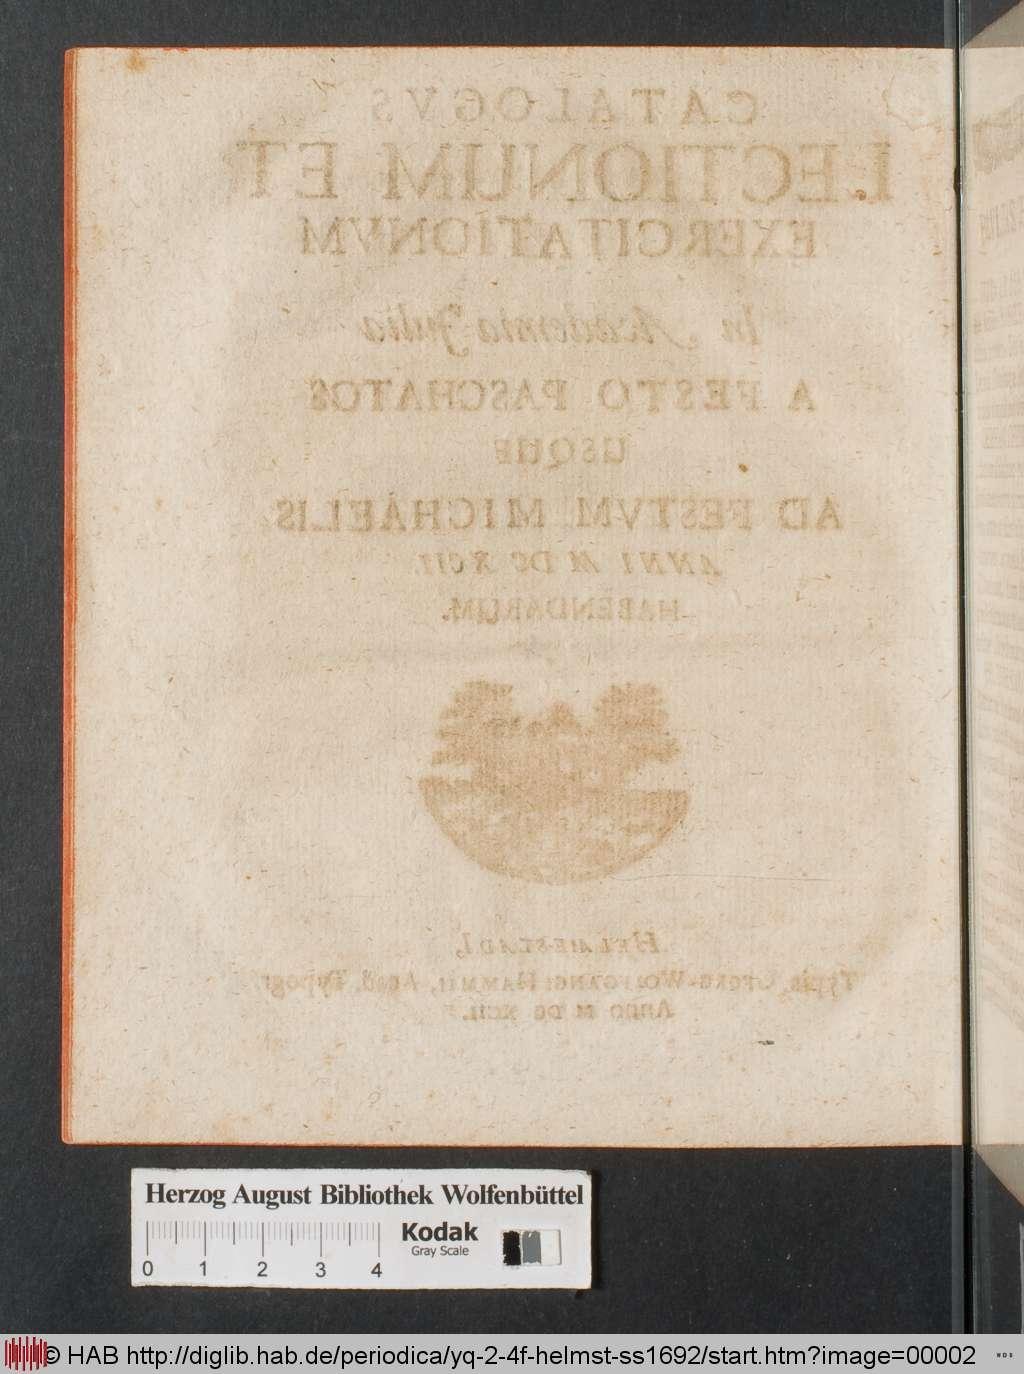 http://diglib.hab.de/periodica/yq-2-4f-helmst-ss1692/00002.jpg